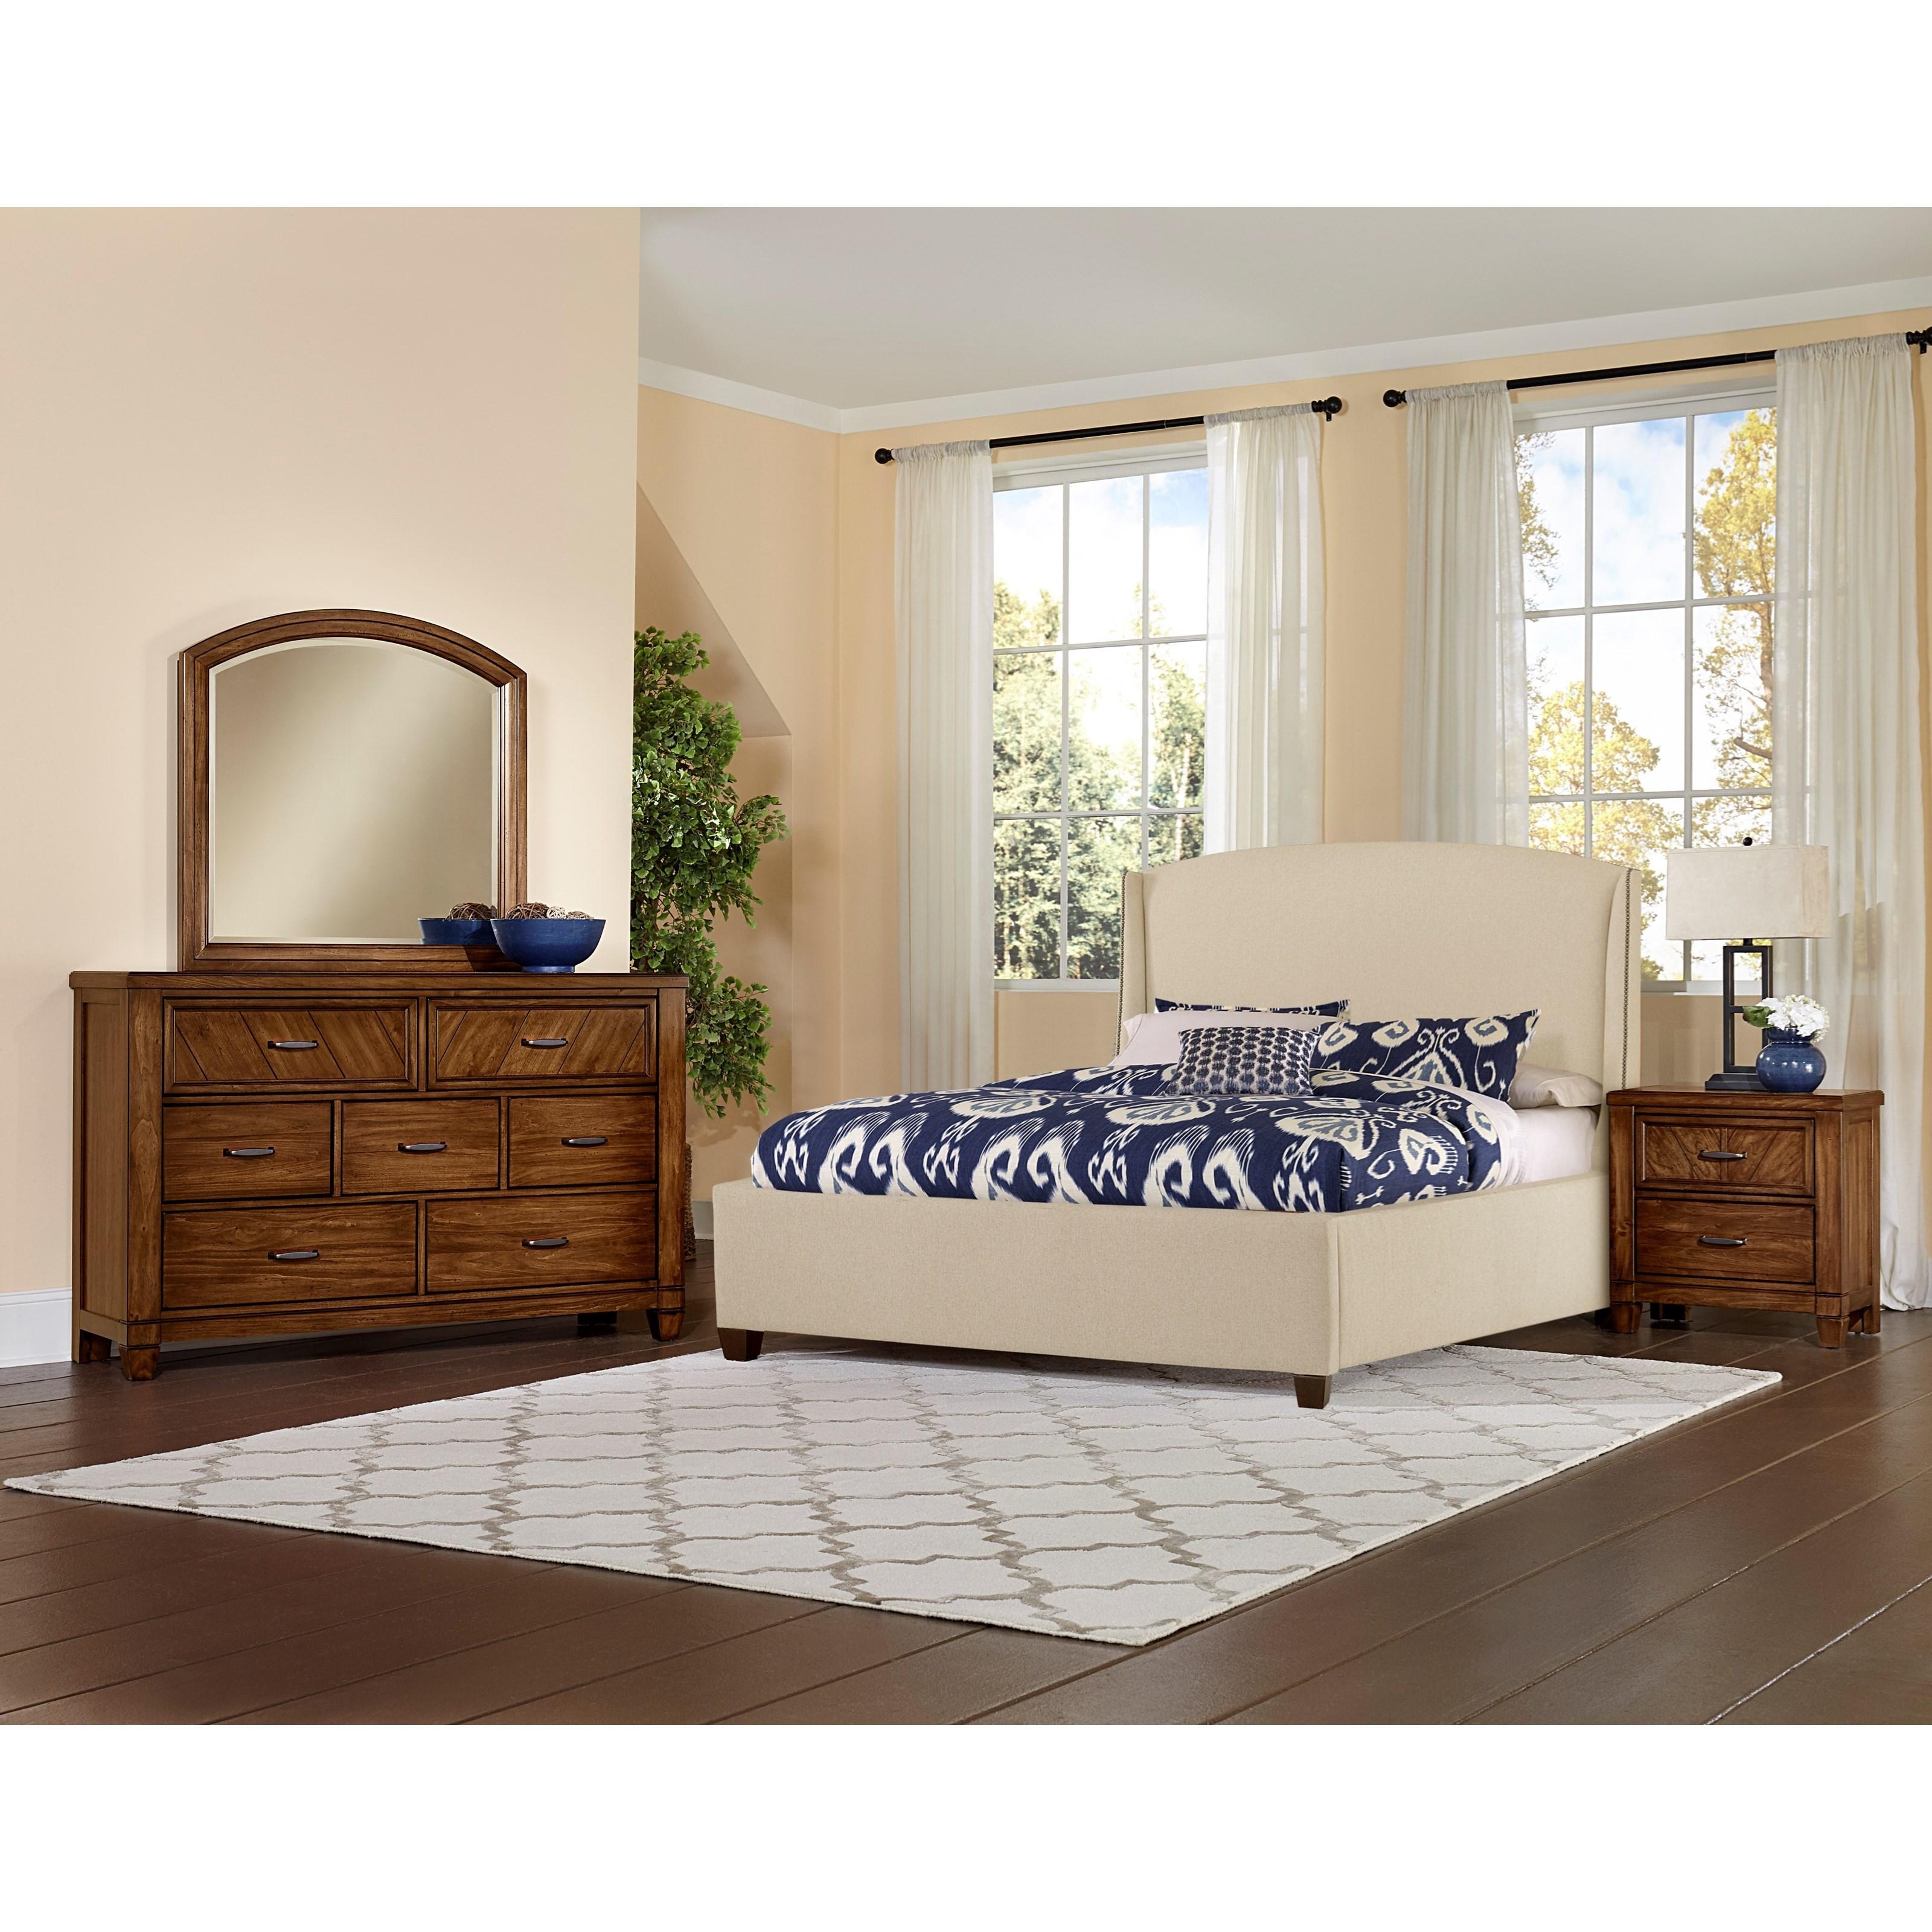 Vaughan bassett rustic cottage king bedroom group for Rustic cottage bedroom